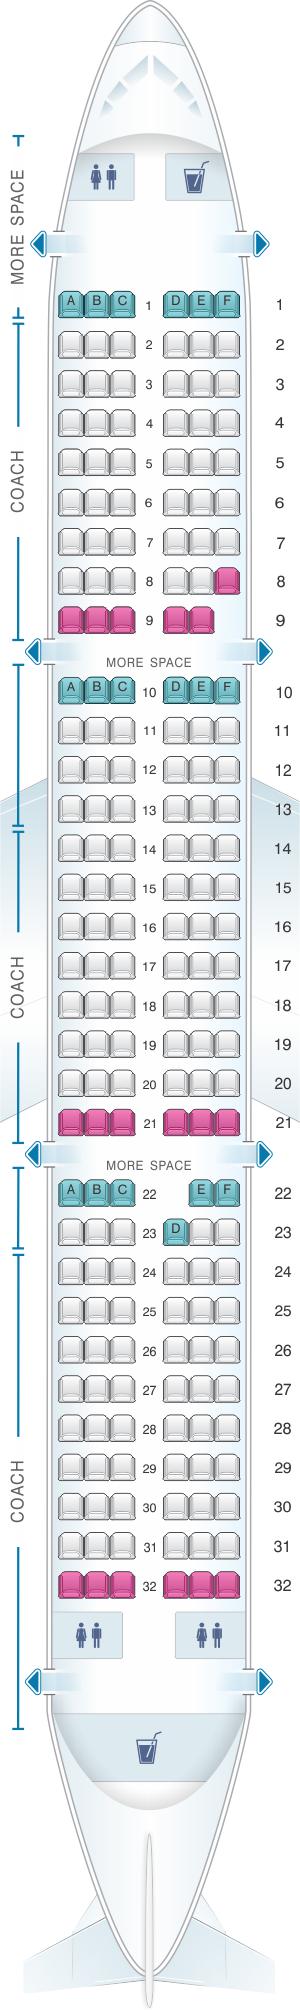 Seat Map JetBlue Airways Airbus A321 Config 1 SeatMaestro - Us Airways A321 Seat Map